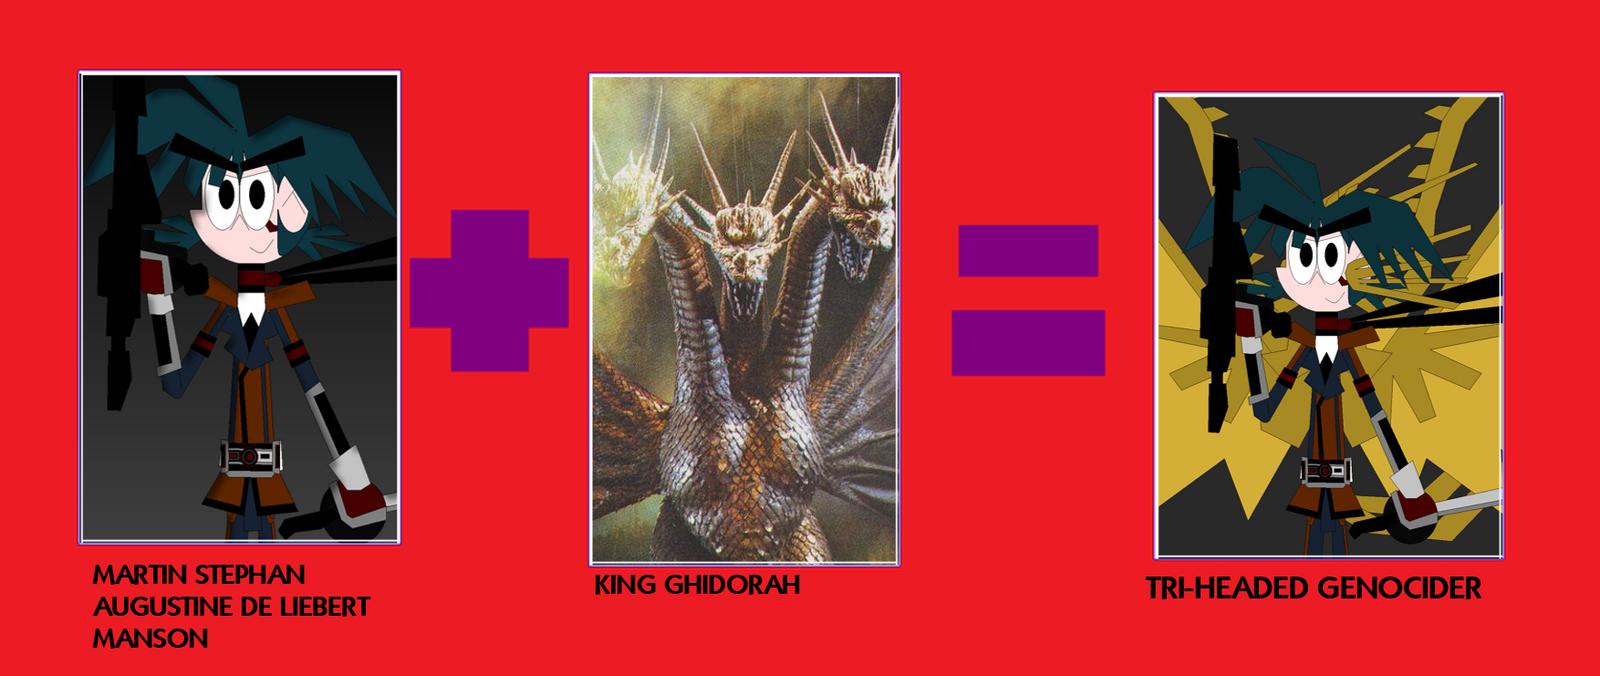 Manson And King Ghidorah Fusion Meme by MarioStrikerMurphy ...